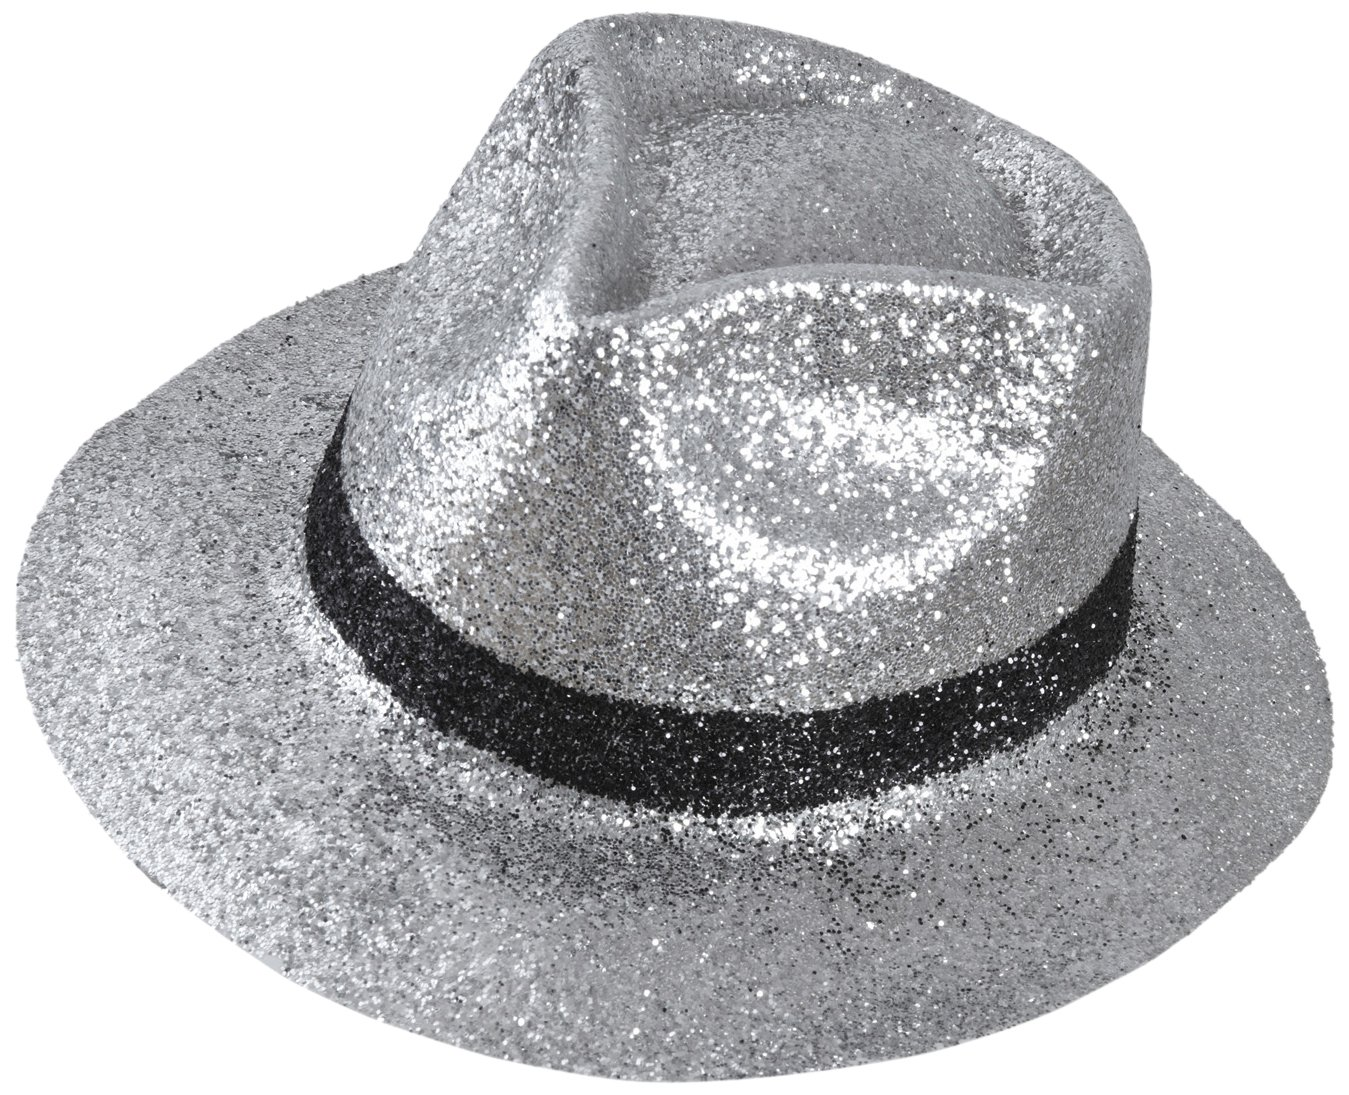 Amazon.com  Adult s Silver Glitter Fedora Hat  Health   Personal Care 8f7956a1f74